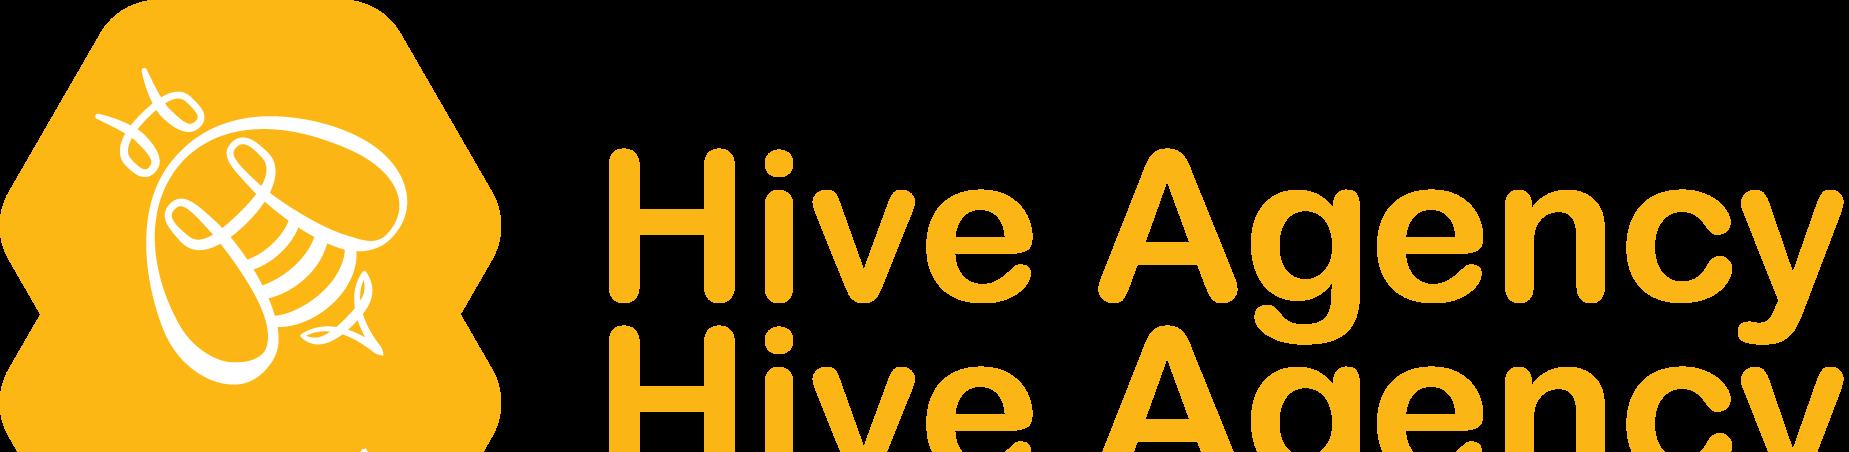 Hive Agency